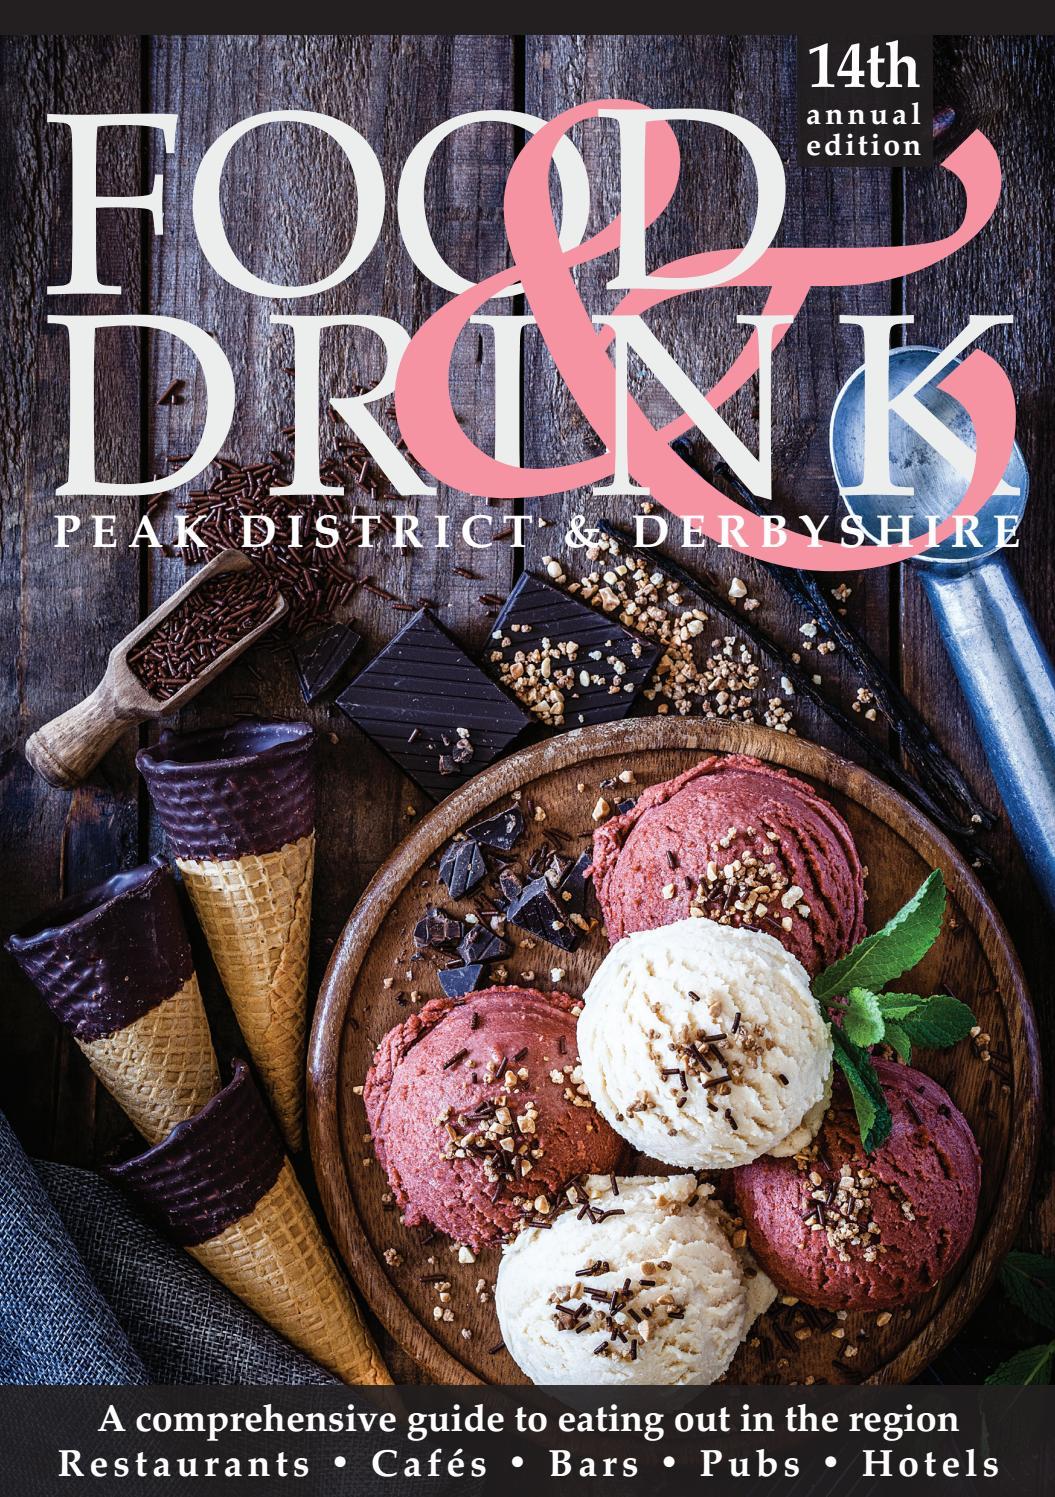 Peak District Derbyshire Food Drink Guide 2019 2020 By